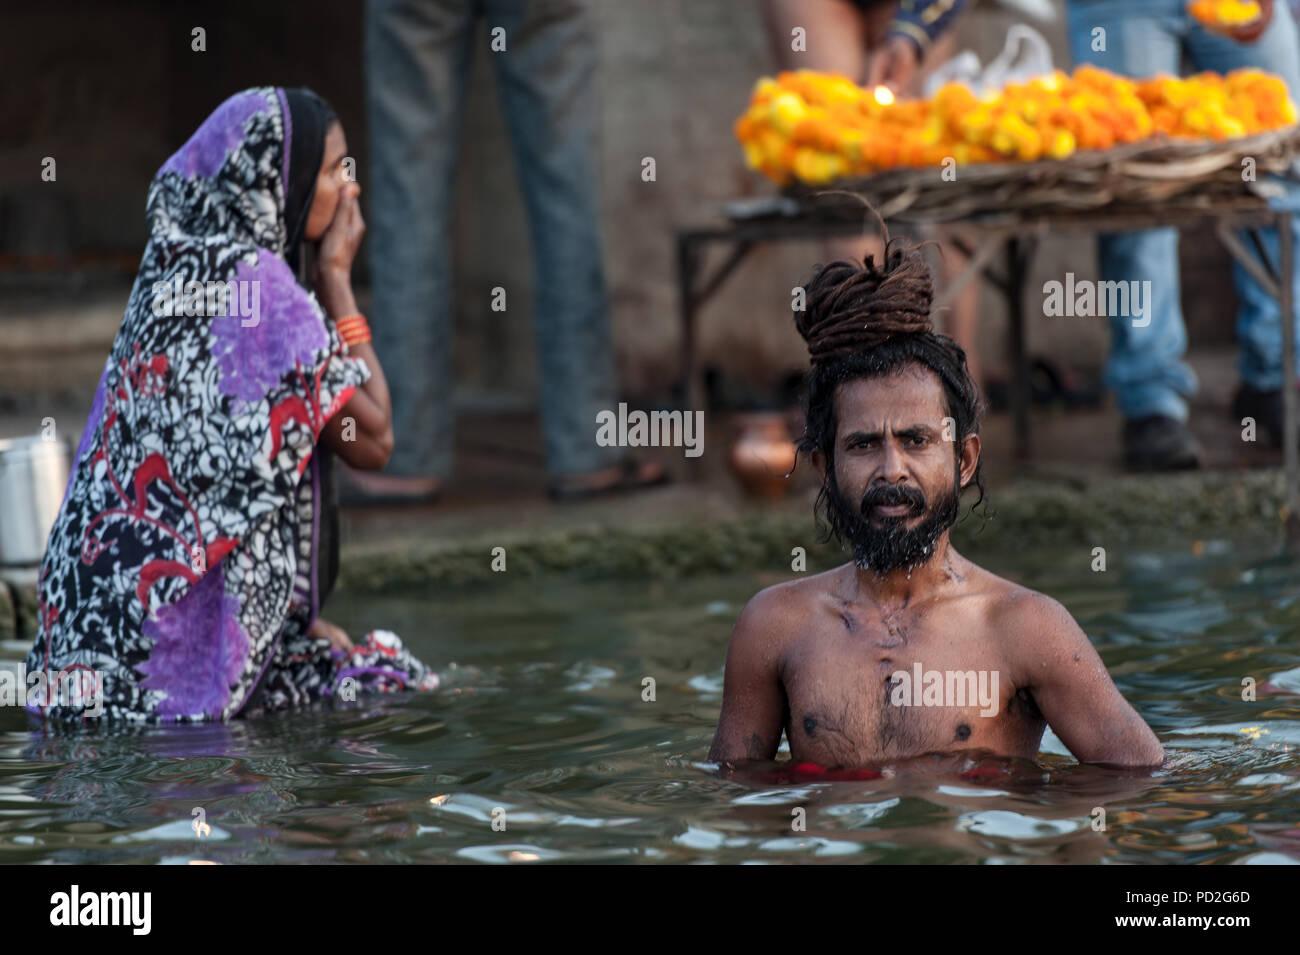 Persone si bagnano nelle acque del sacro Gange a Varanasi, Uttar Pradesh, India Immagini Stock